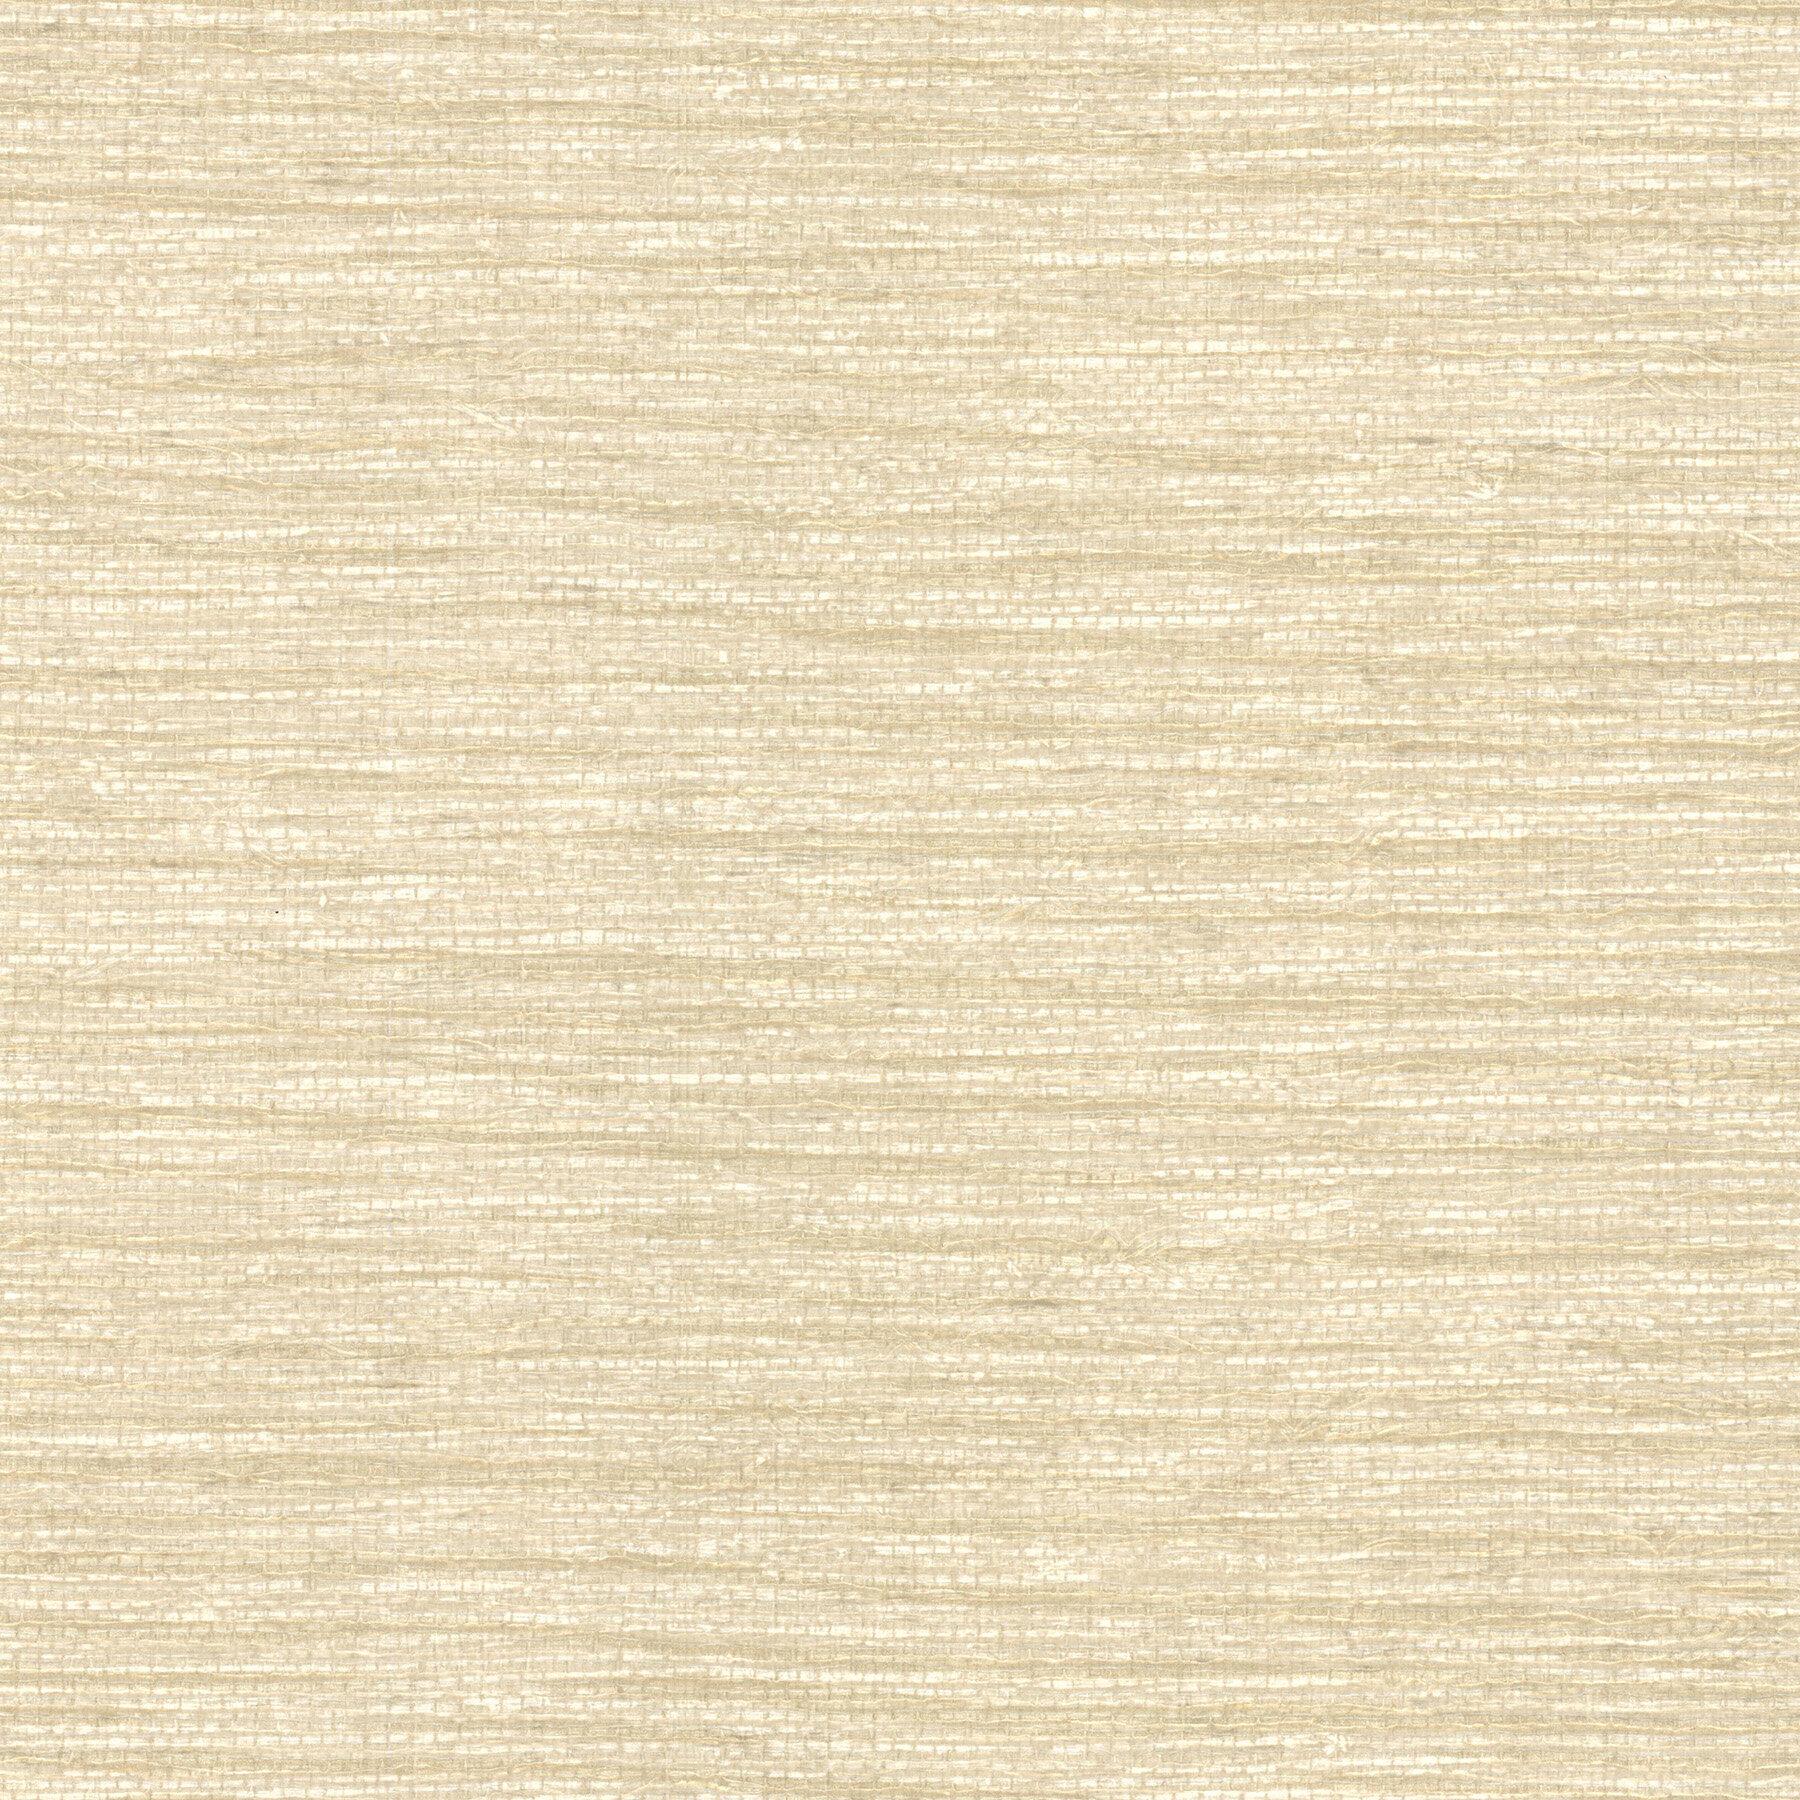 Wallpaper Trends 2017 Grasscloth Grassweave Natural: Grasscloth Wallpaper History 2017